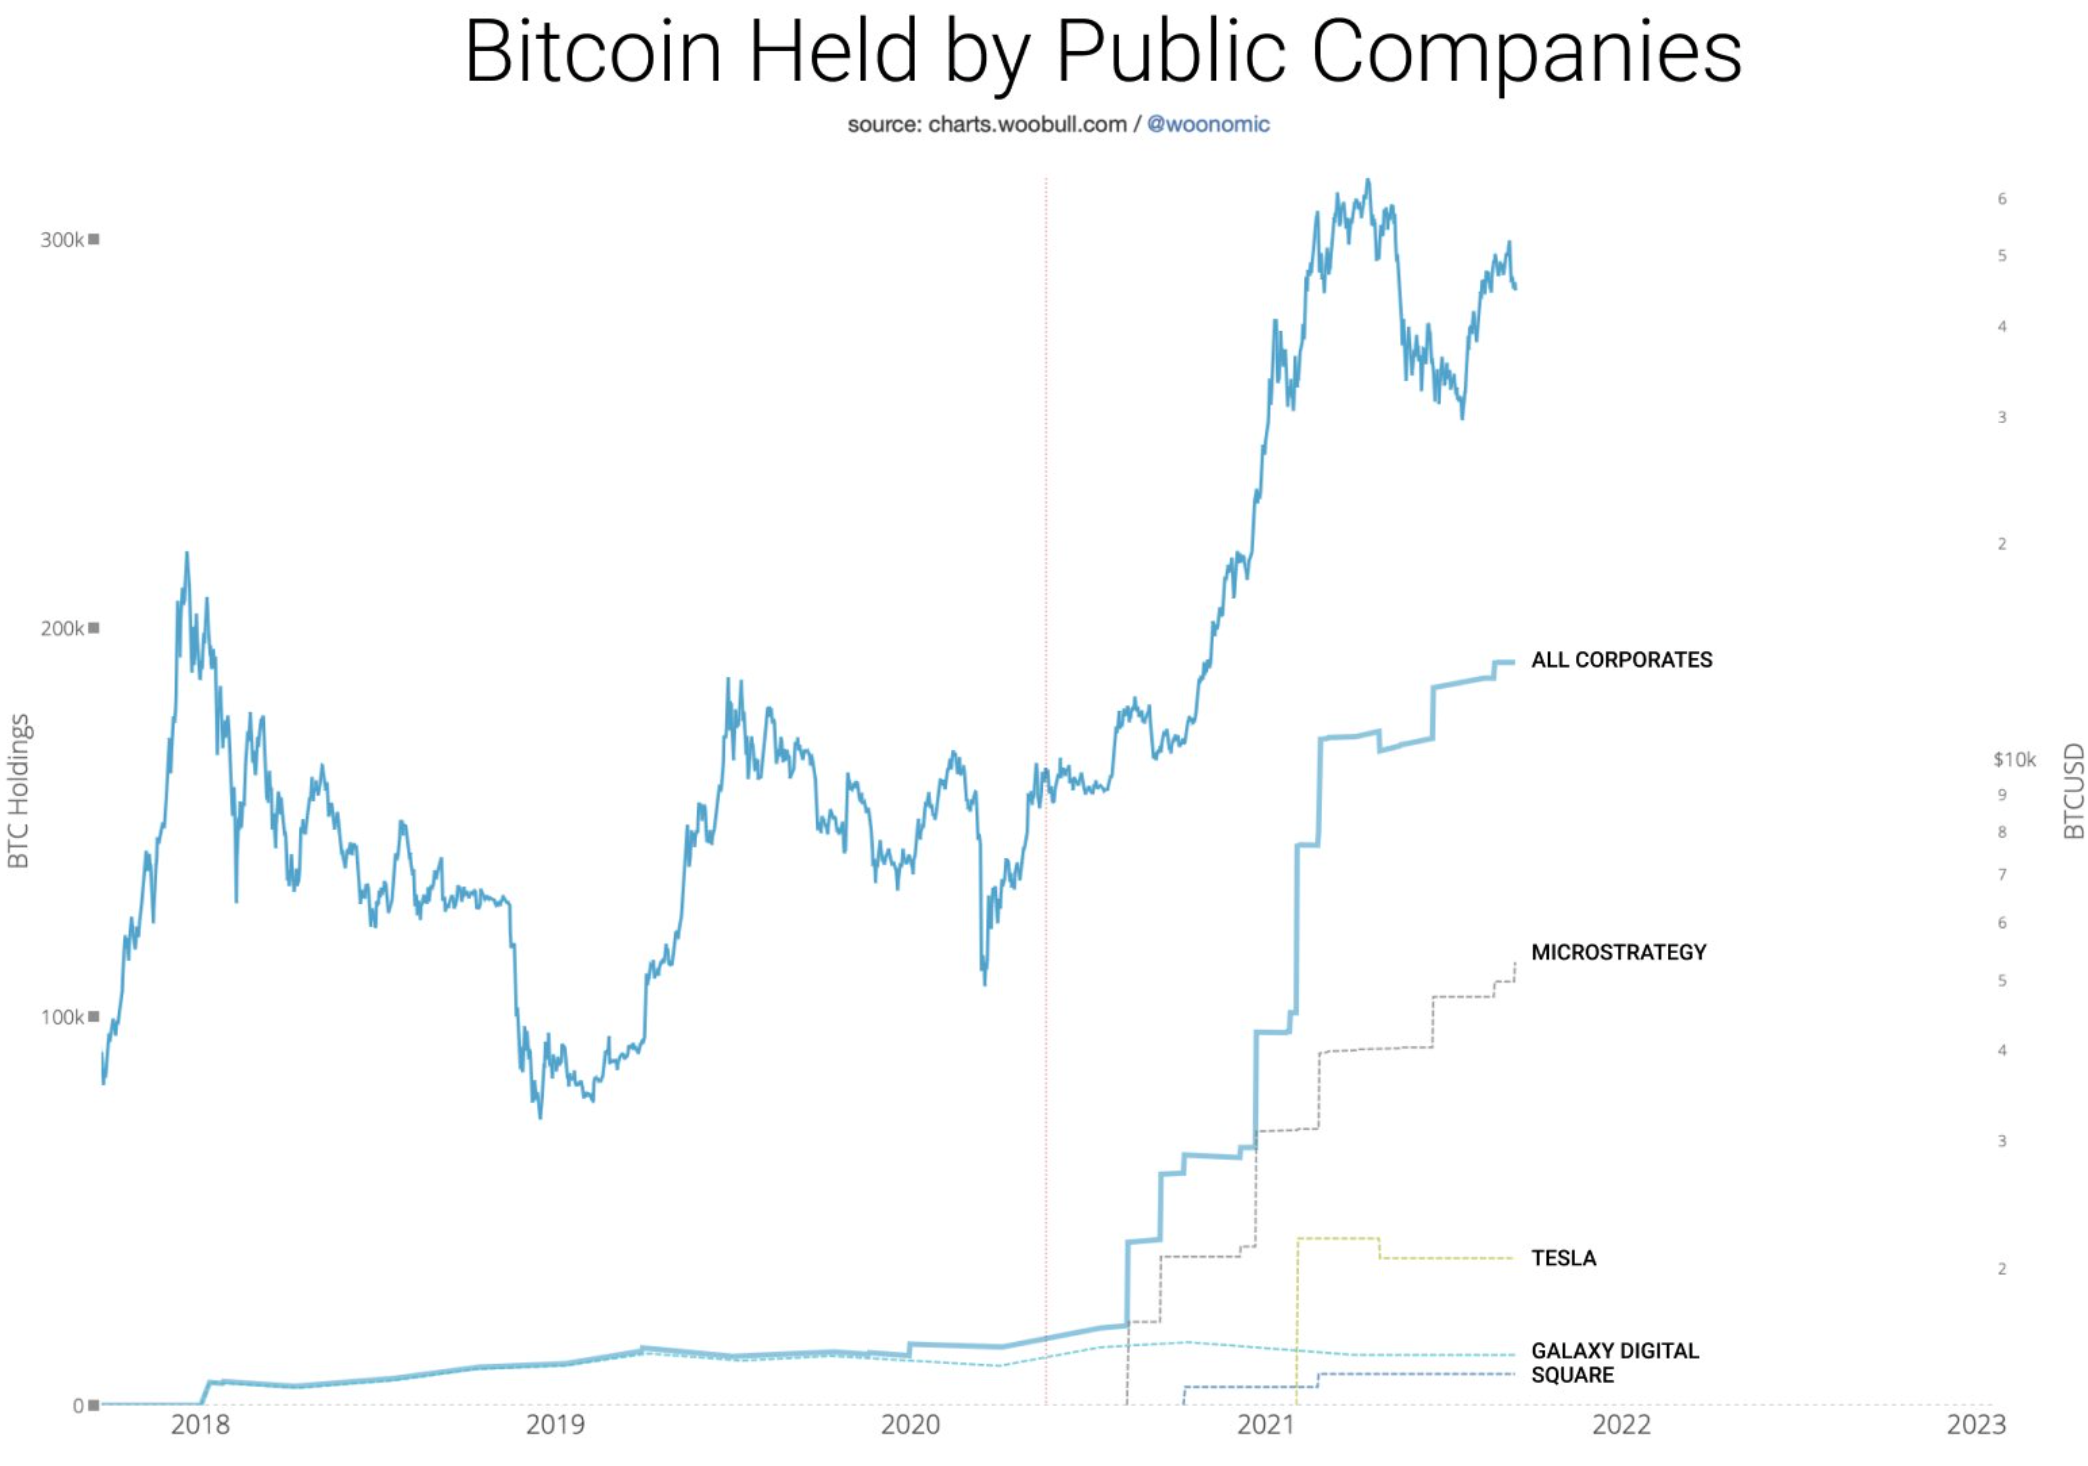 MicroStrategy의 Bitcoin은 단순히 '딥 구매'에 관한 것입니까?